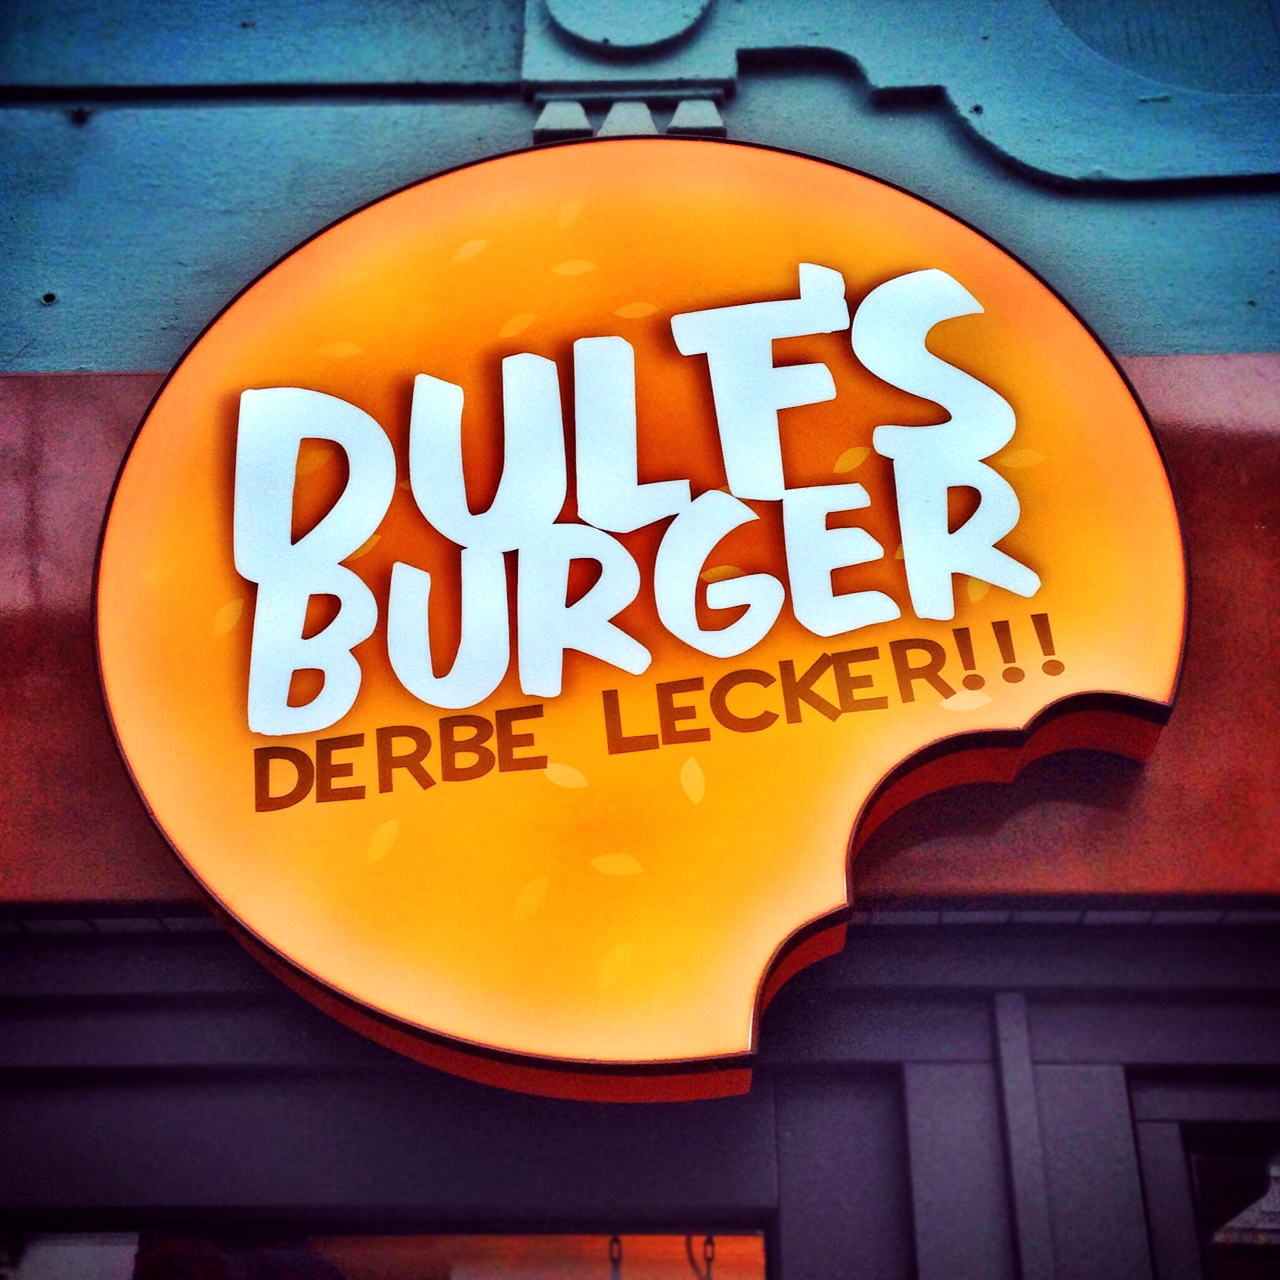 dulfsburger hamburg